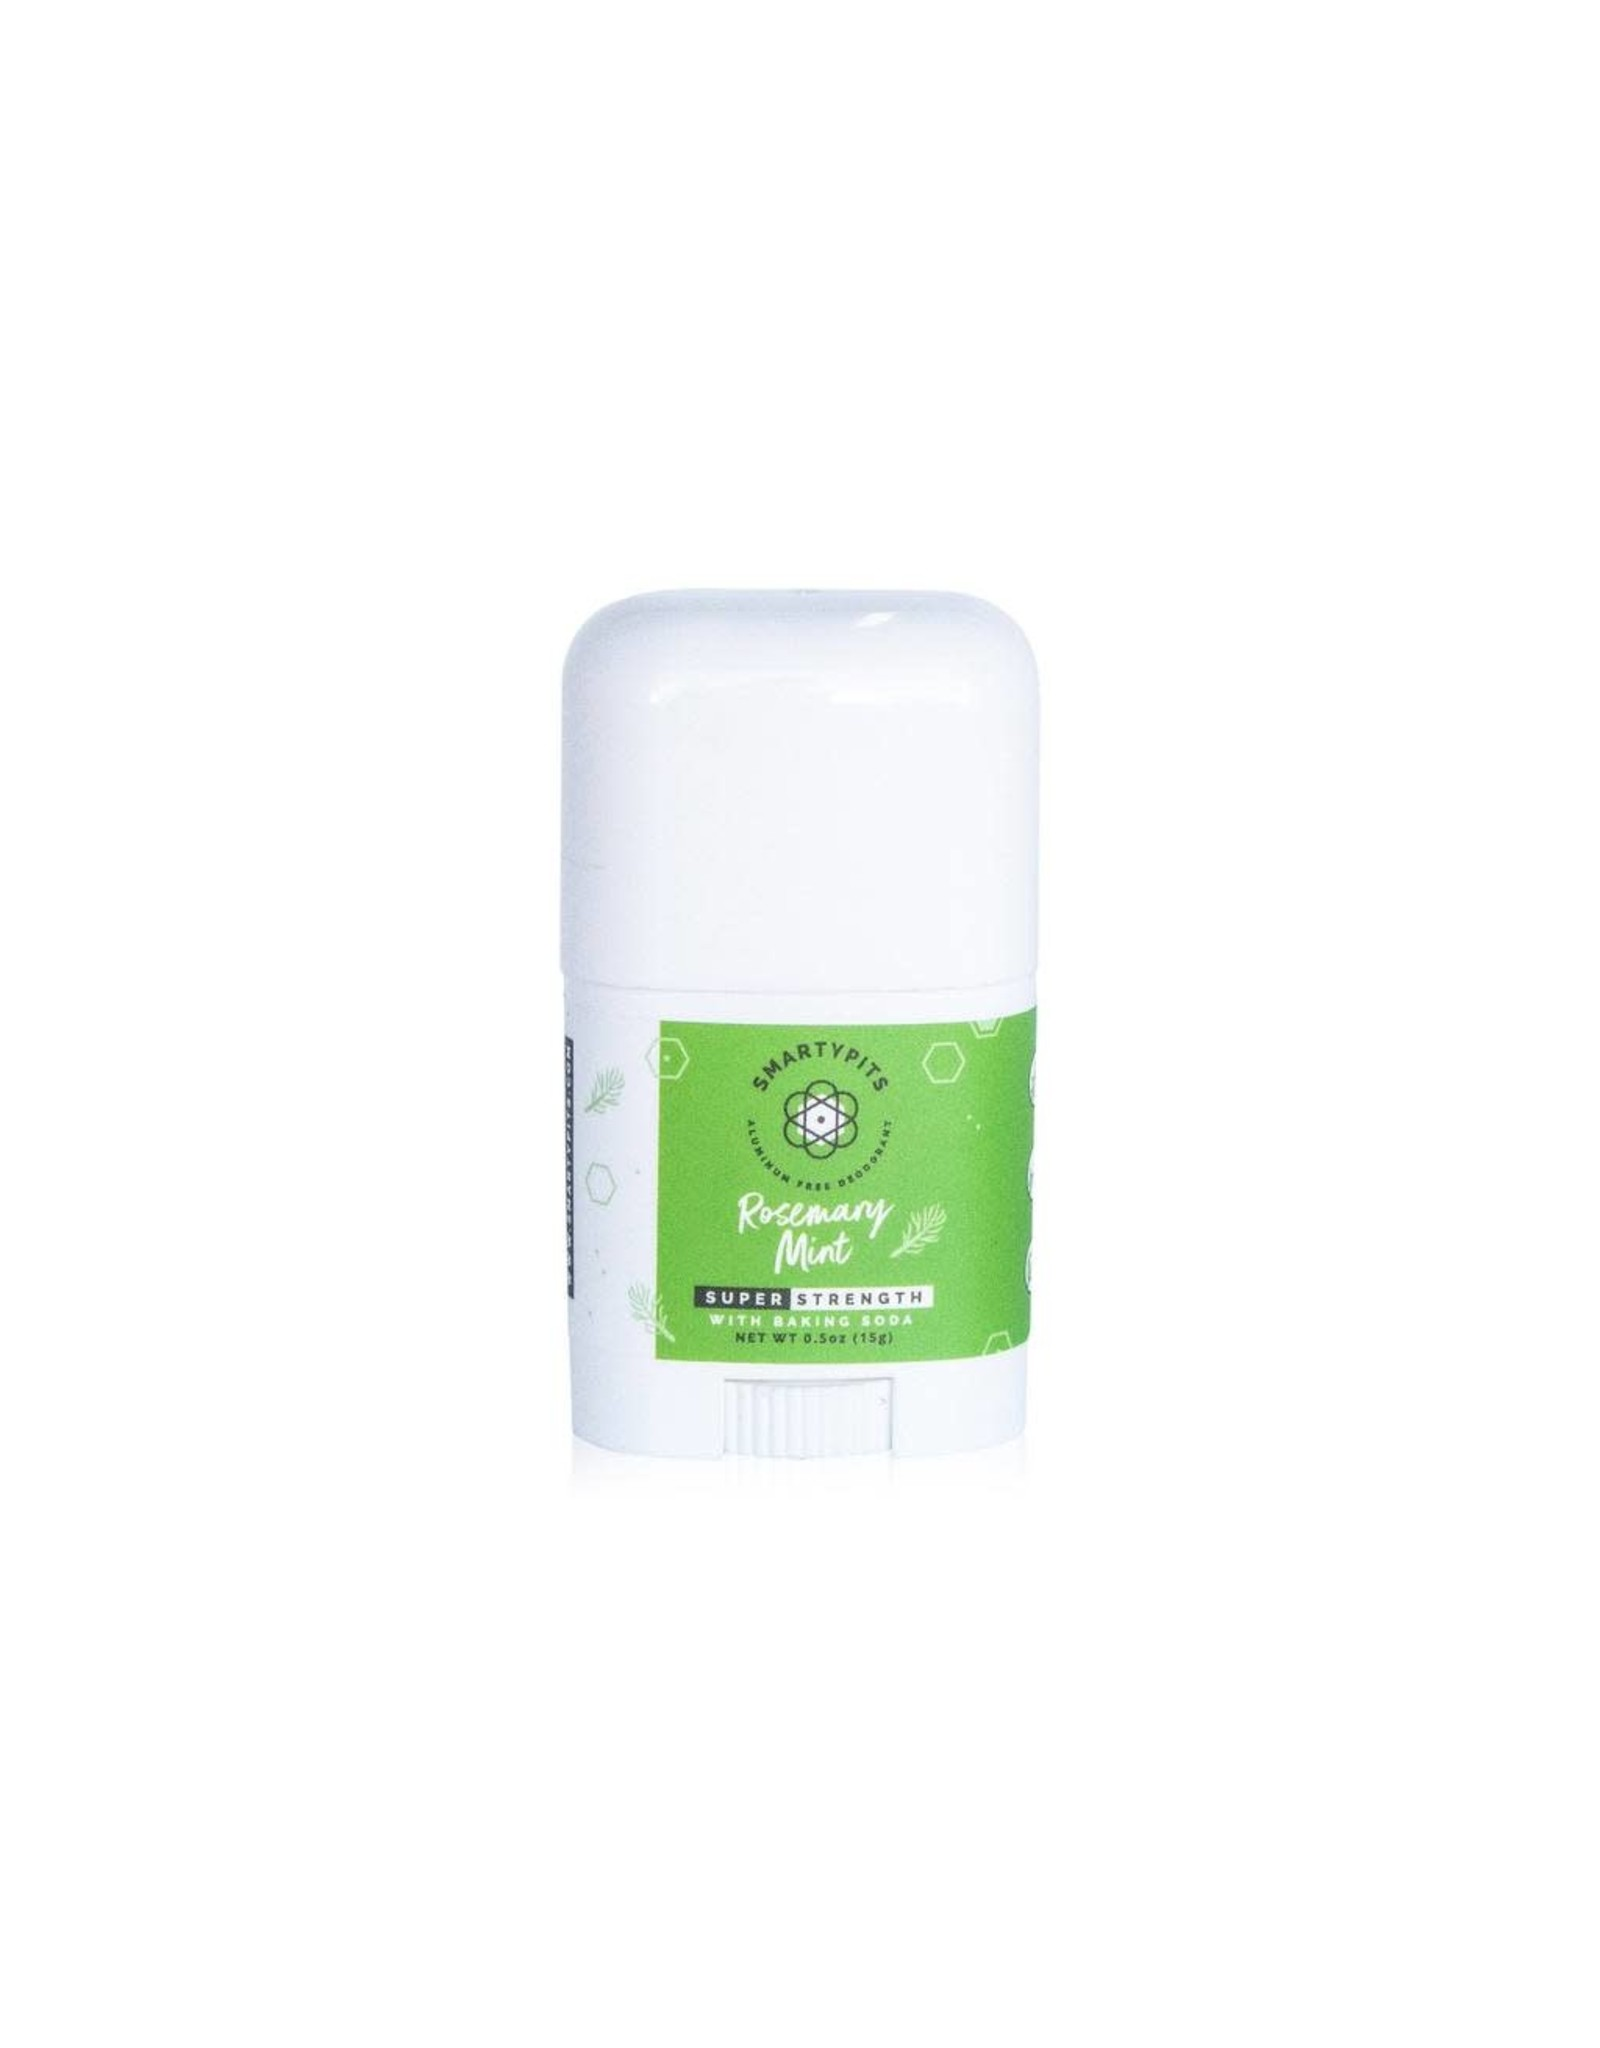 Deodorant, Aluminum, Rosemary Mint 0.5 oz